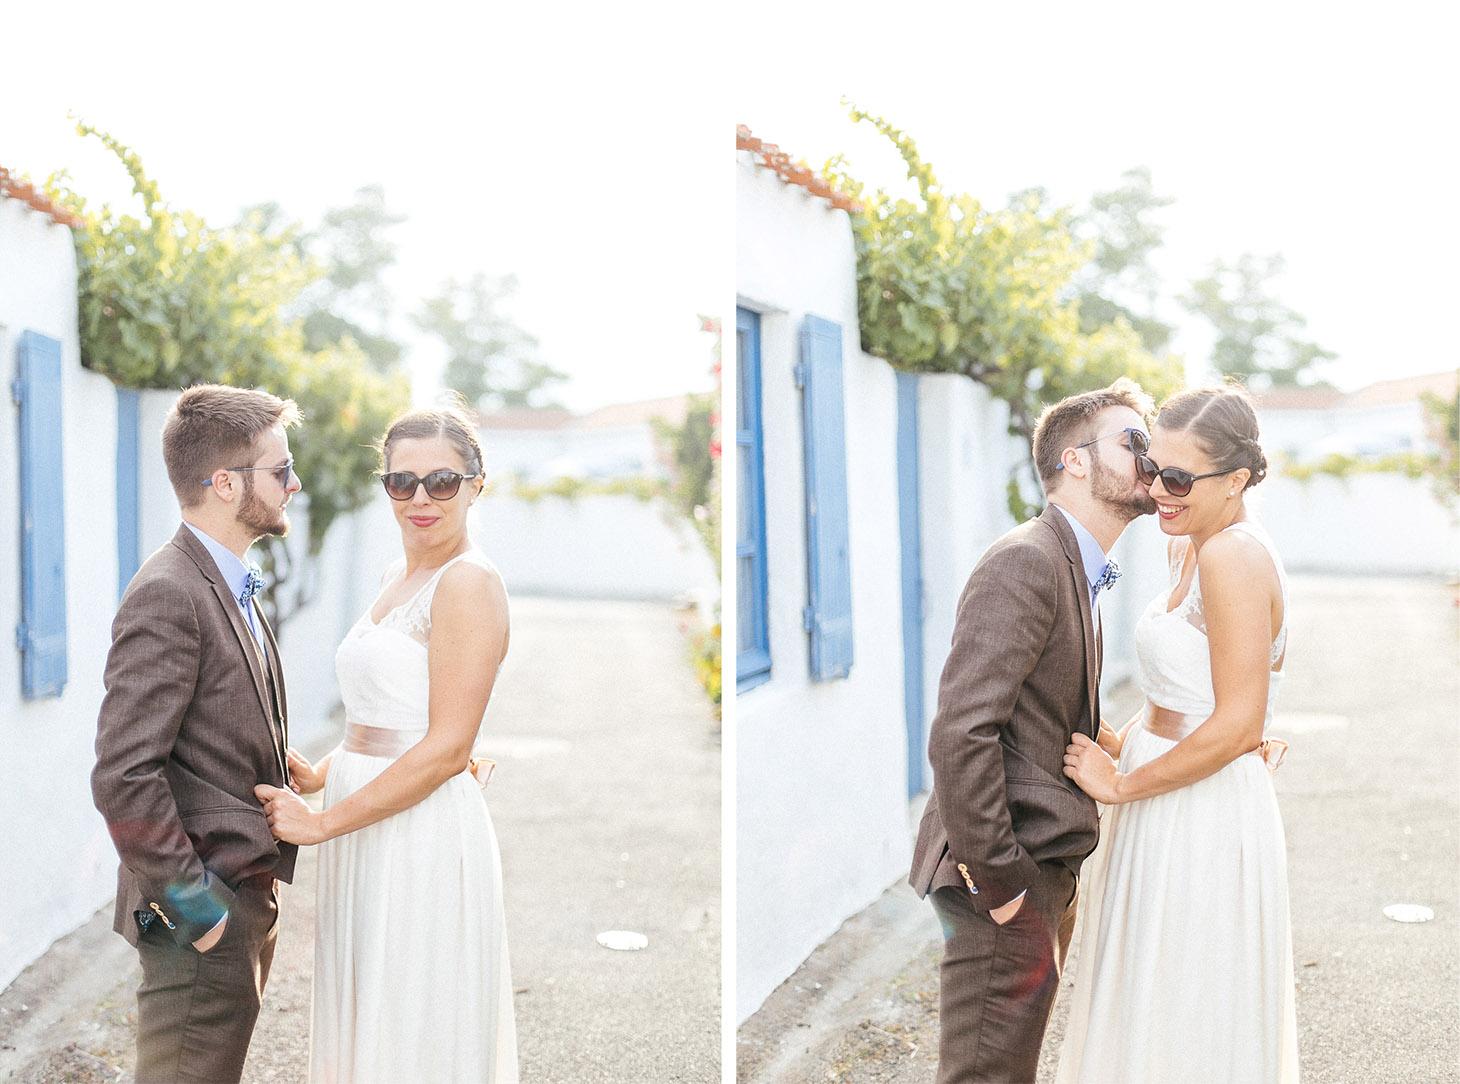 photographe-mariage-ile-d-yeu-0139